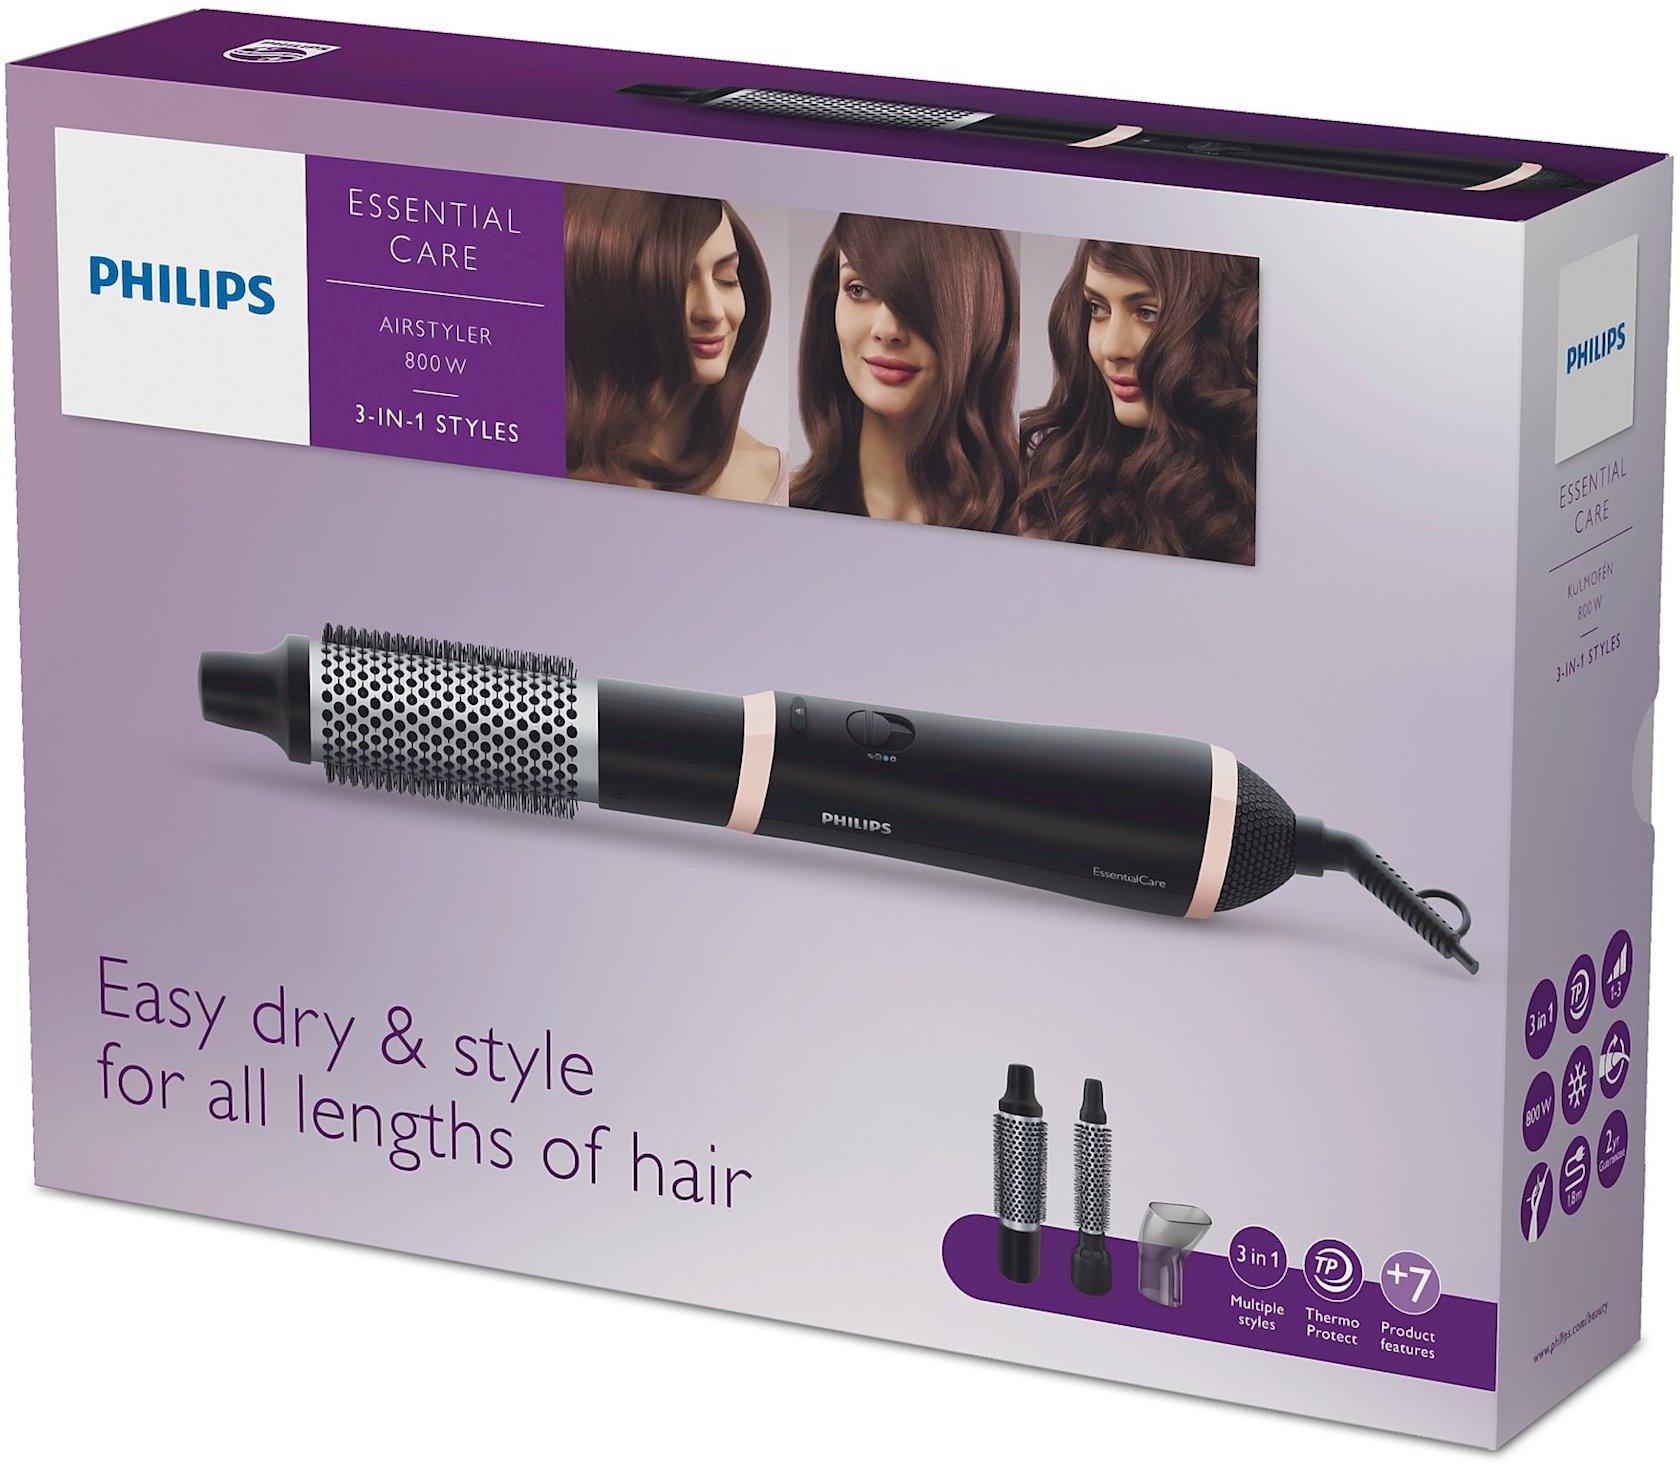 Fen-daraq Philips HP8661 Essential Care